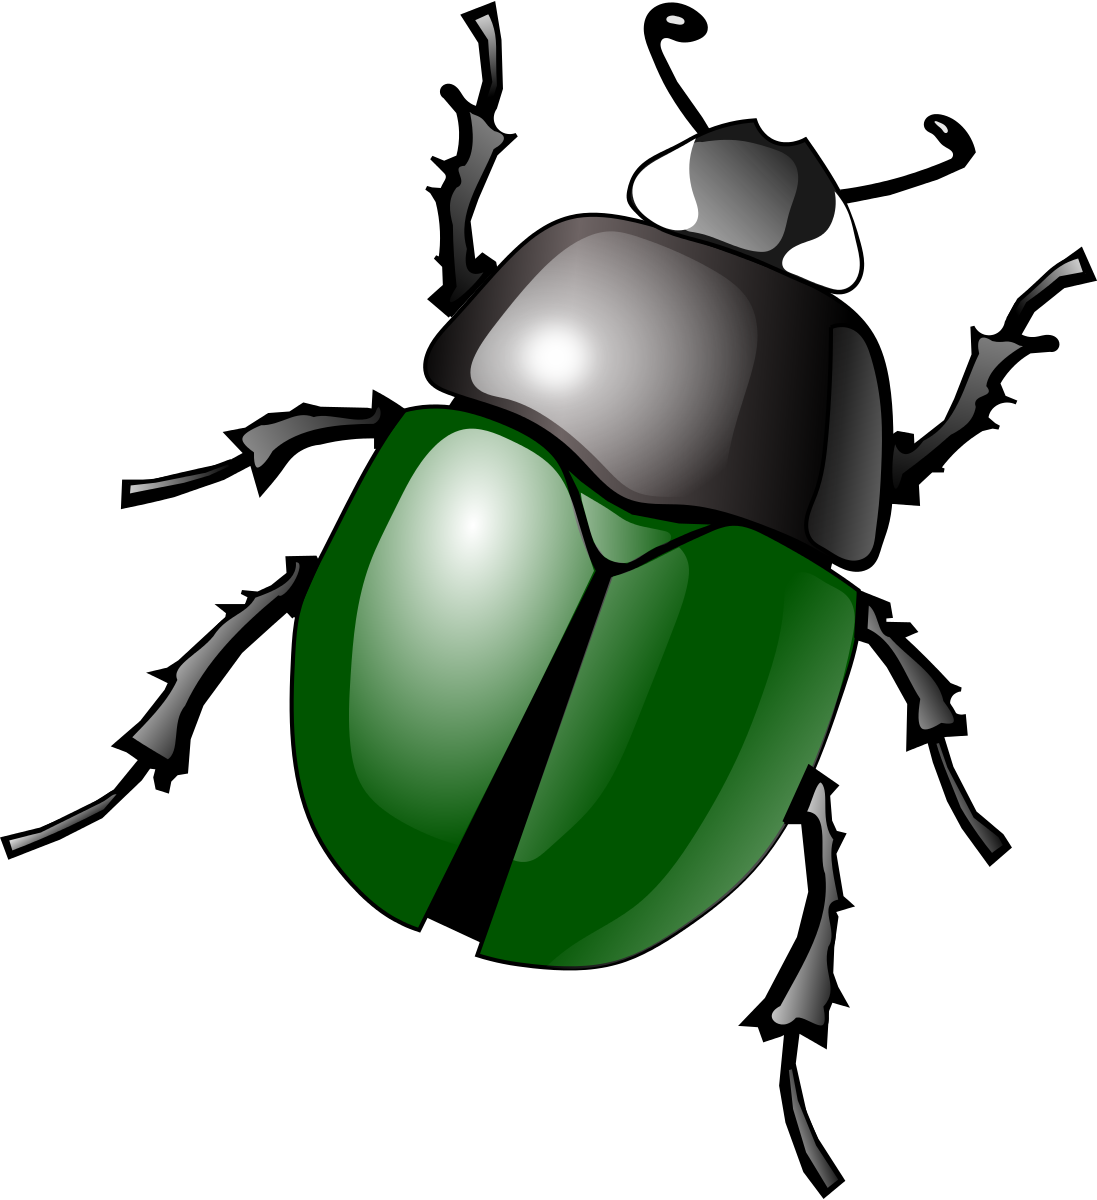 Beetle Clipart-Clipartlook.com-1097-Beetle Clipart-Clipartlook.com-1097-0